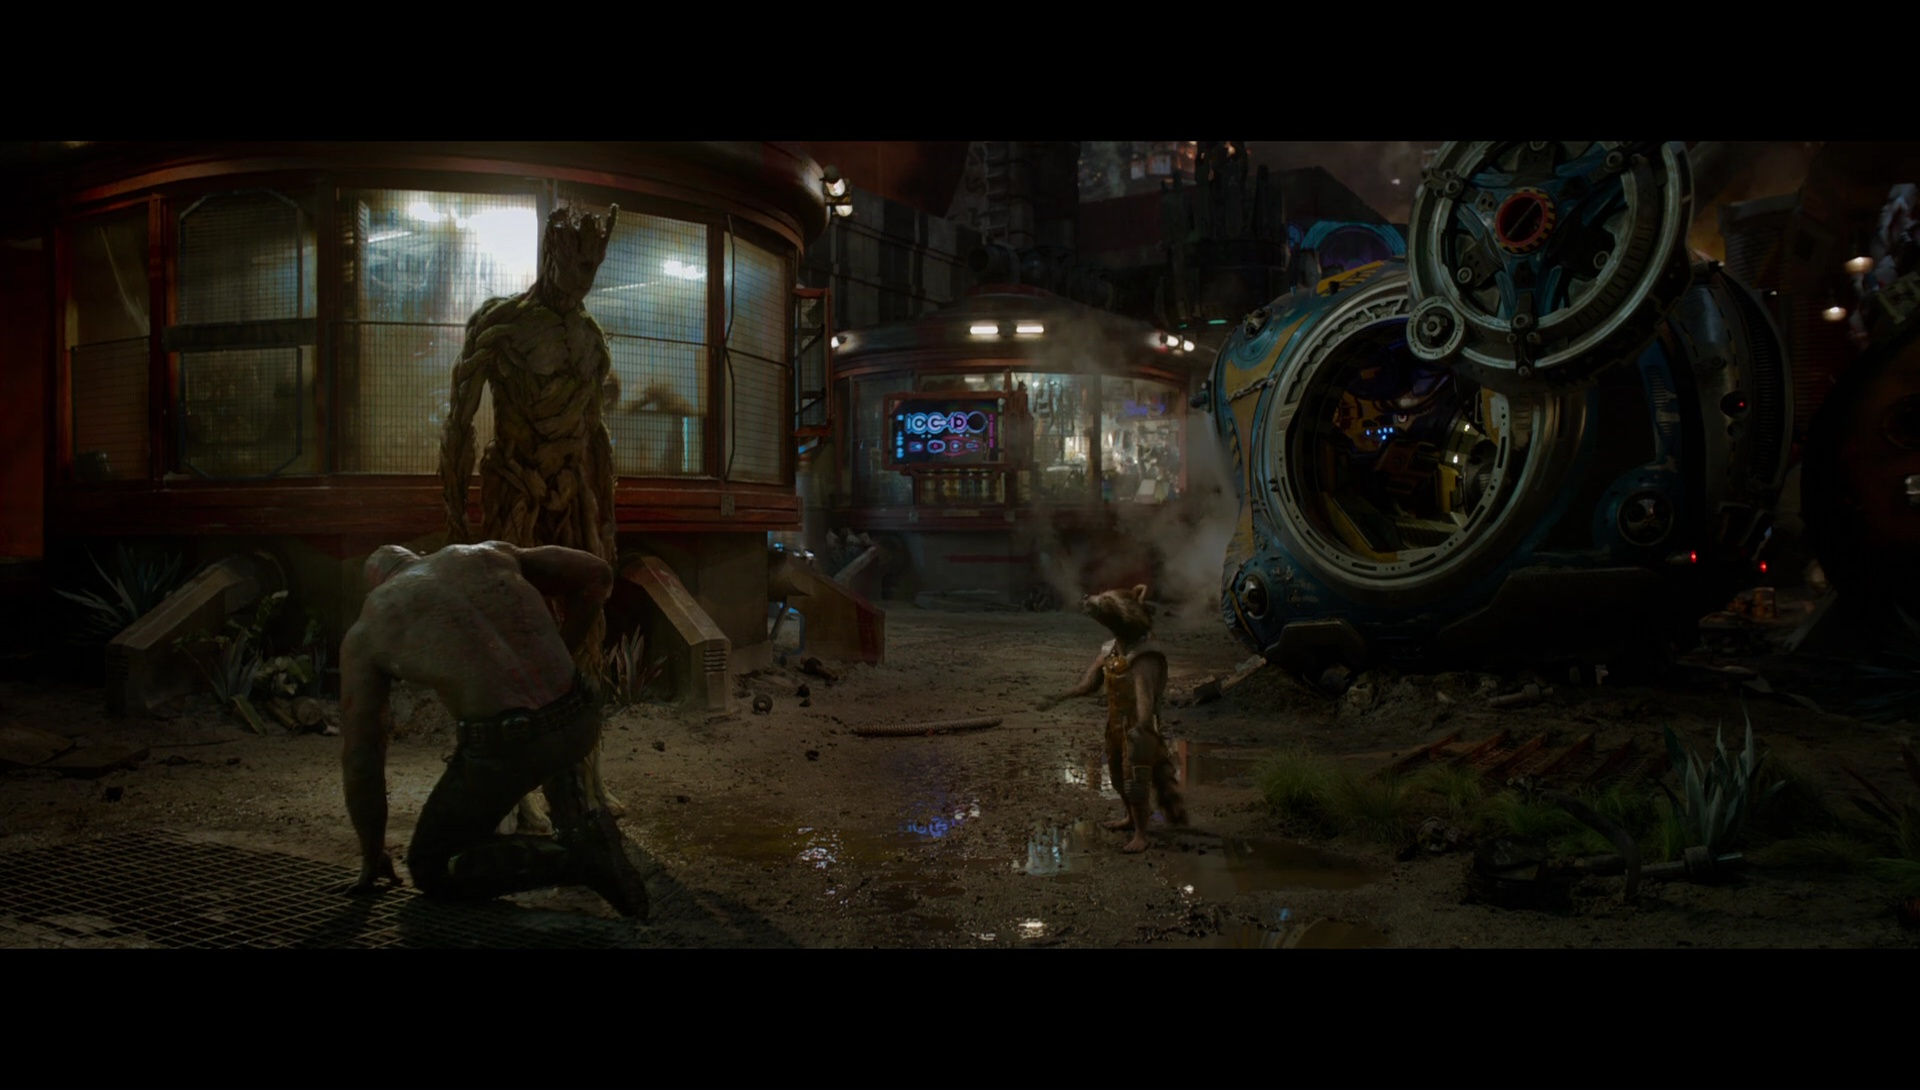 Guardianes De La Galaxia 1080p Lat-Cast-Ing 5.1 (2014)